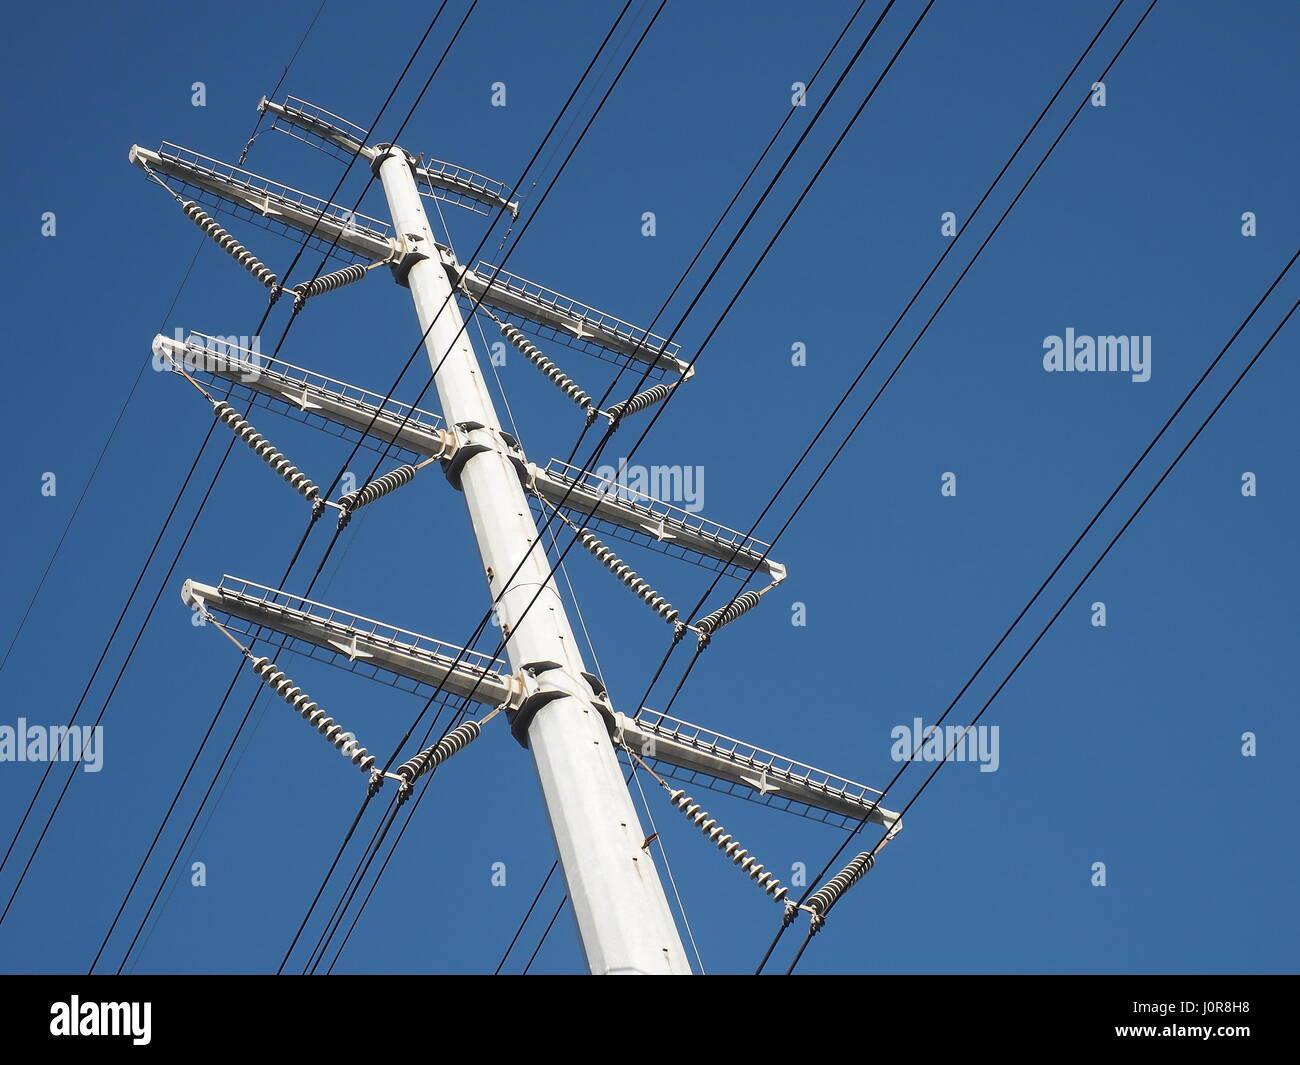 high voltage mono pole transmission line Stock Photo: 138194596 - Alamy